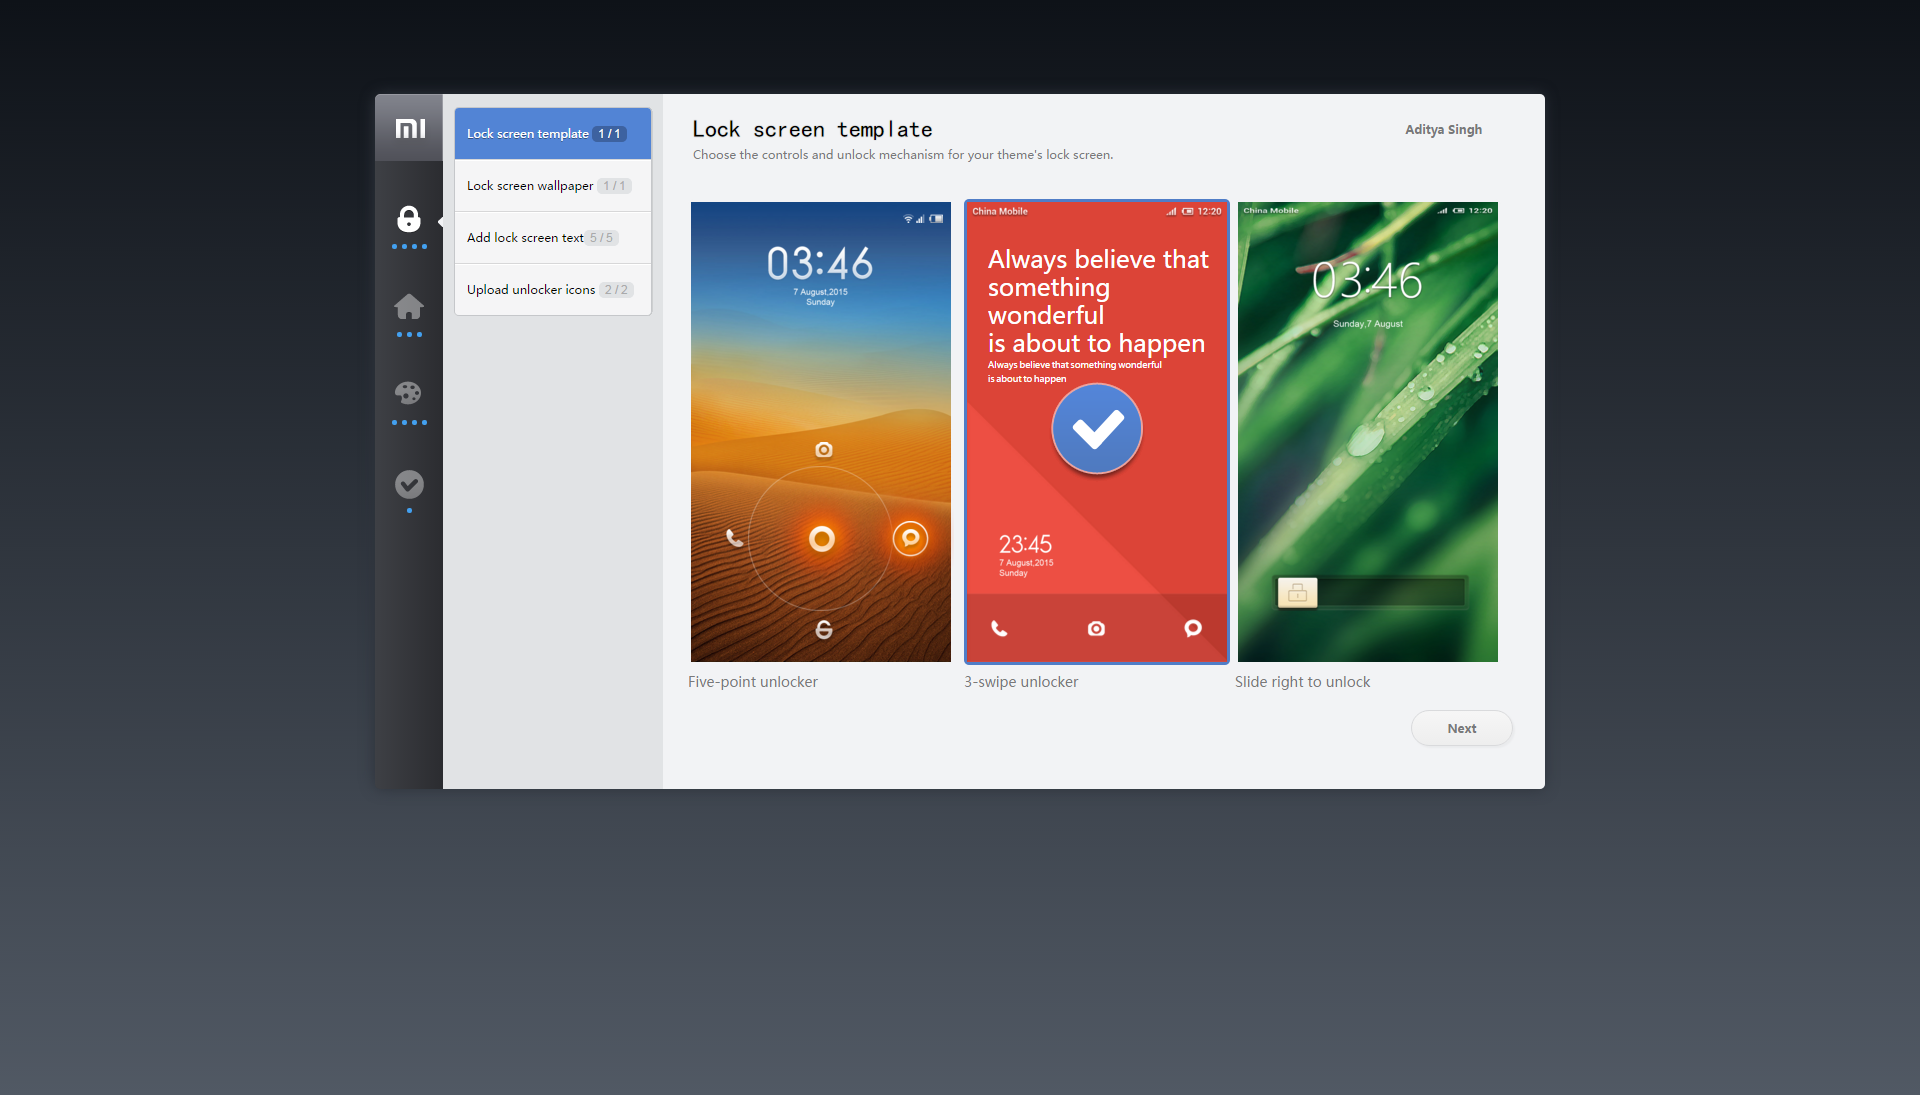 Miui theme editor pro mod apk download | MIUI Theme Editor APK OBB